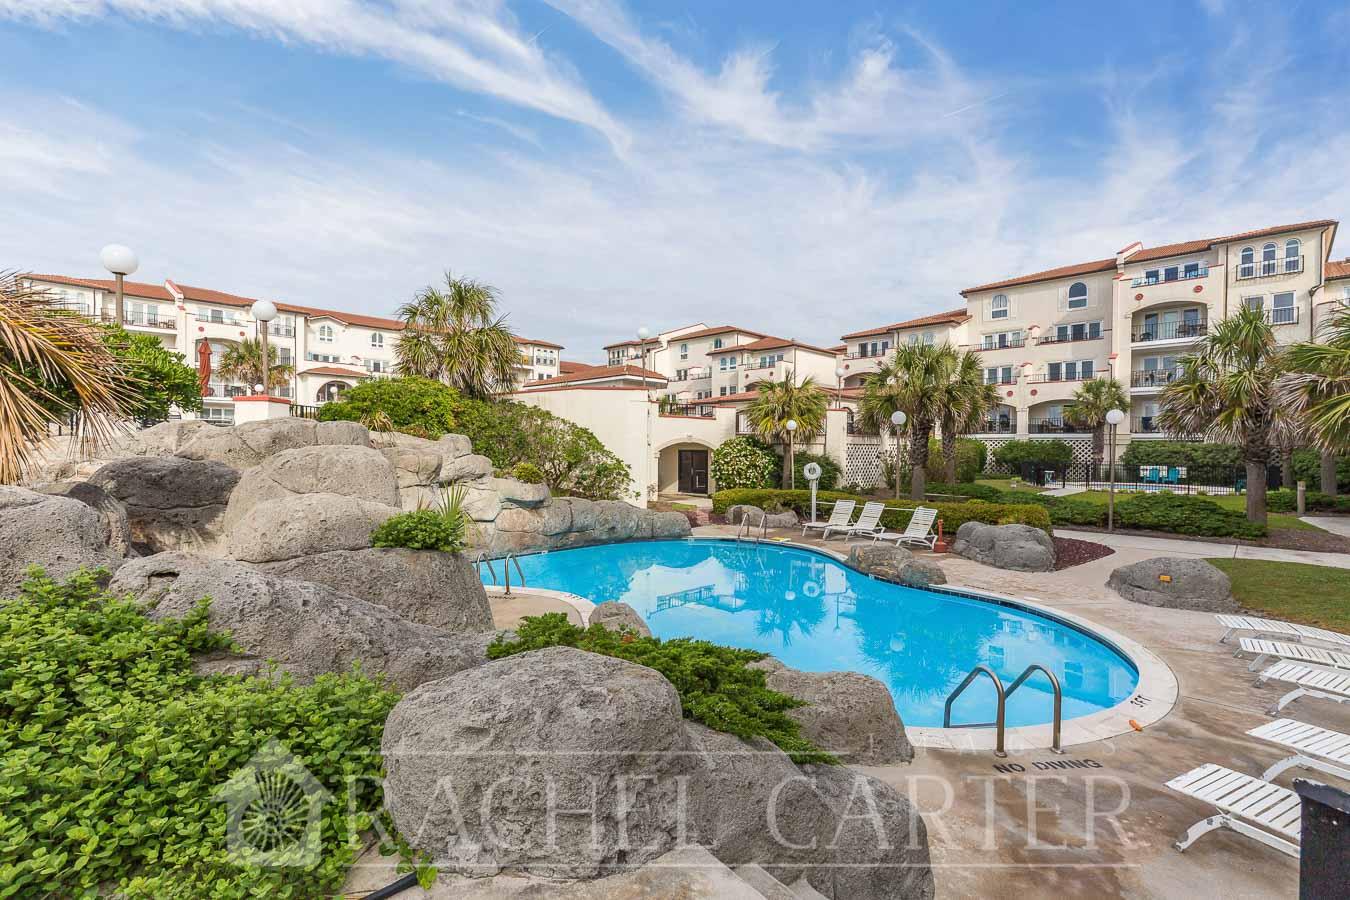 pool villa capriani north topsail beach nc rachel carter images